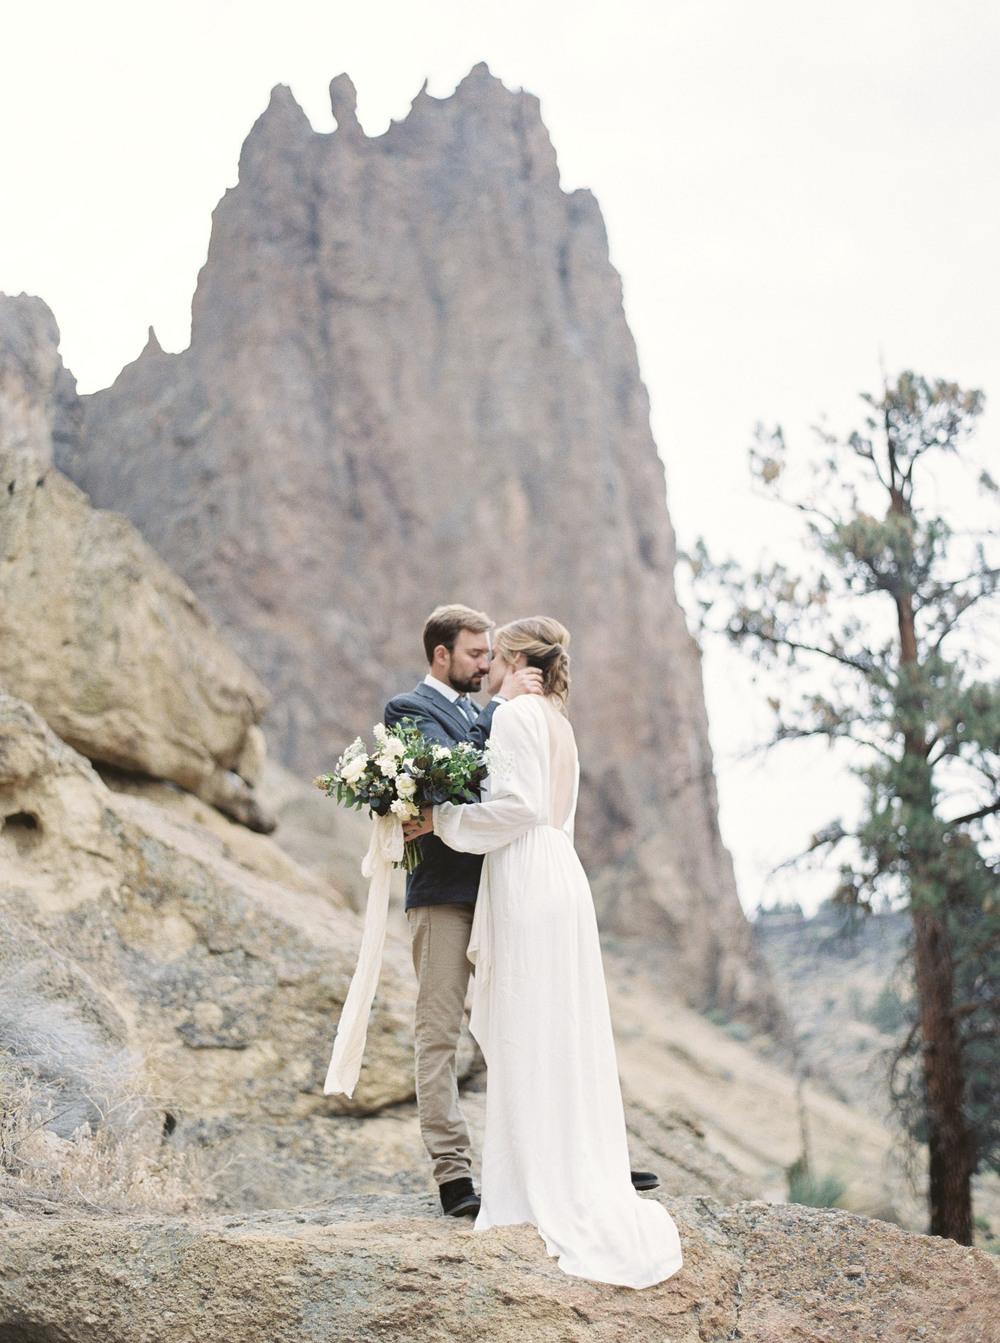 Smith Rock Elopement Bend Oregon Amanda Lenhardt Photography Fine Art Photographer